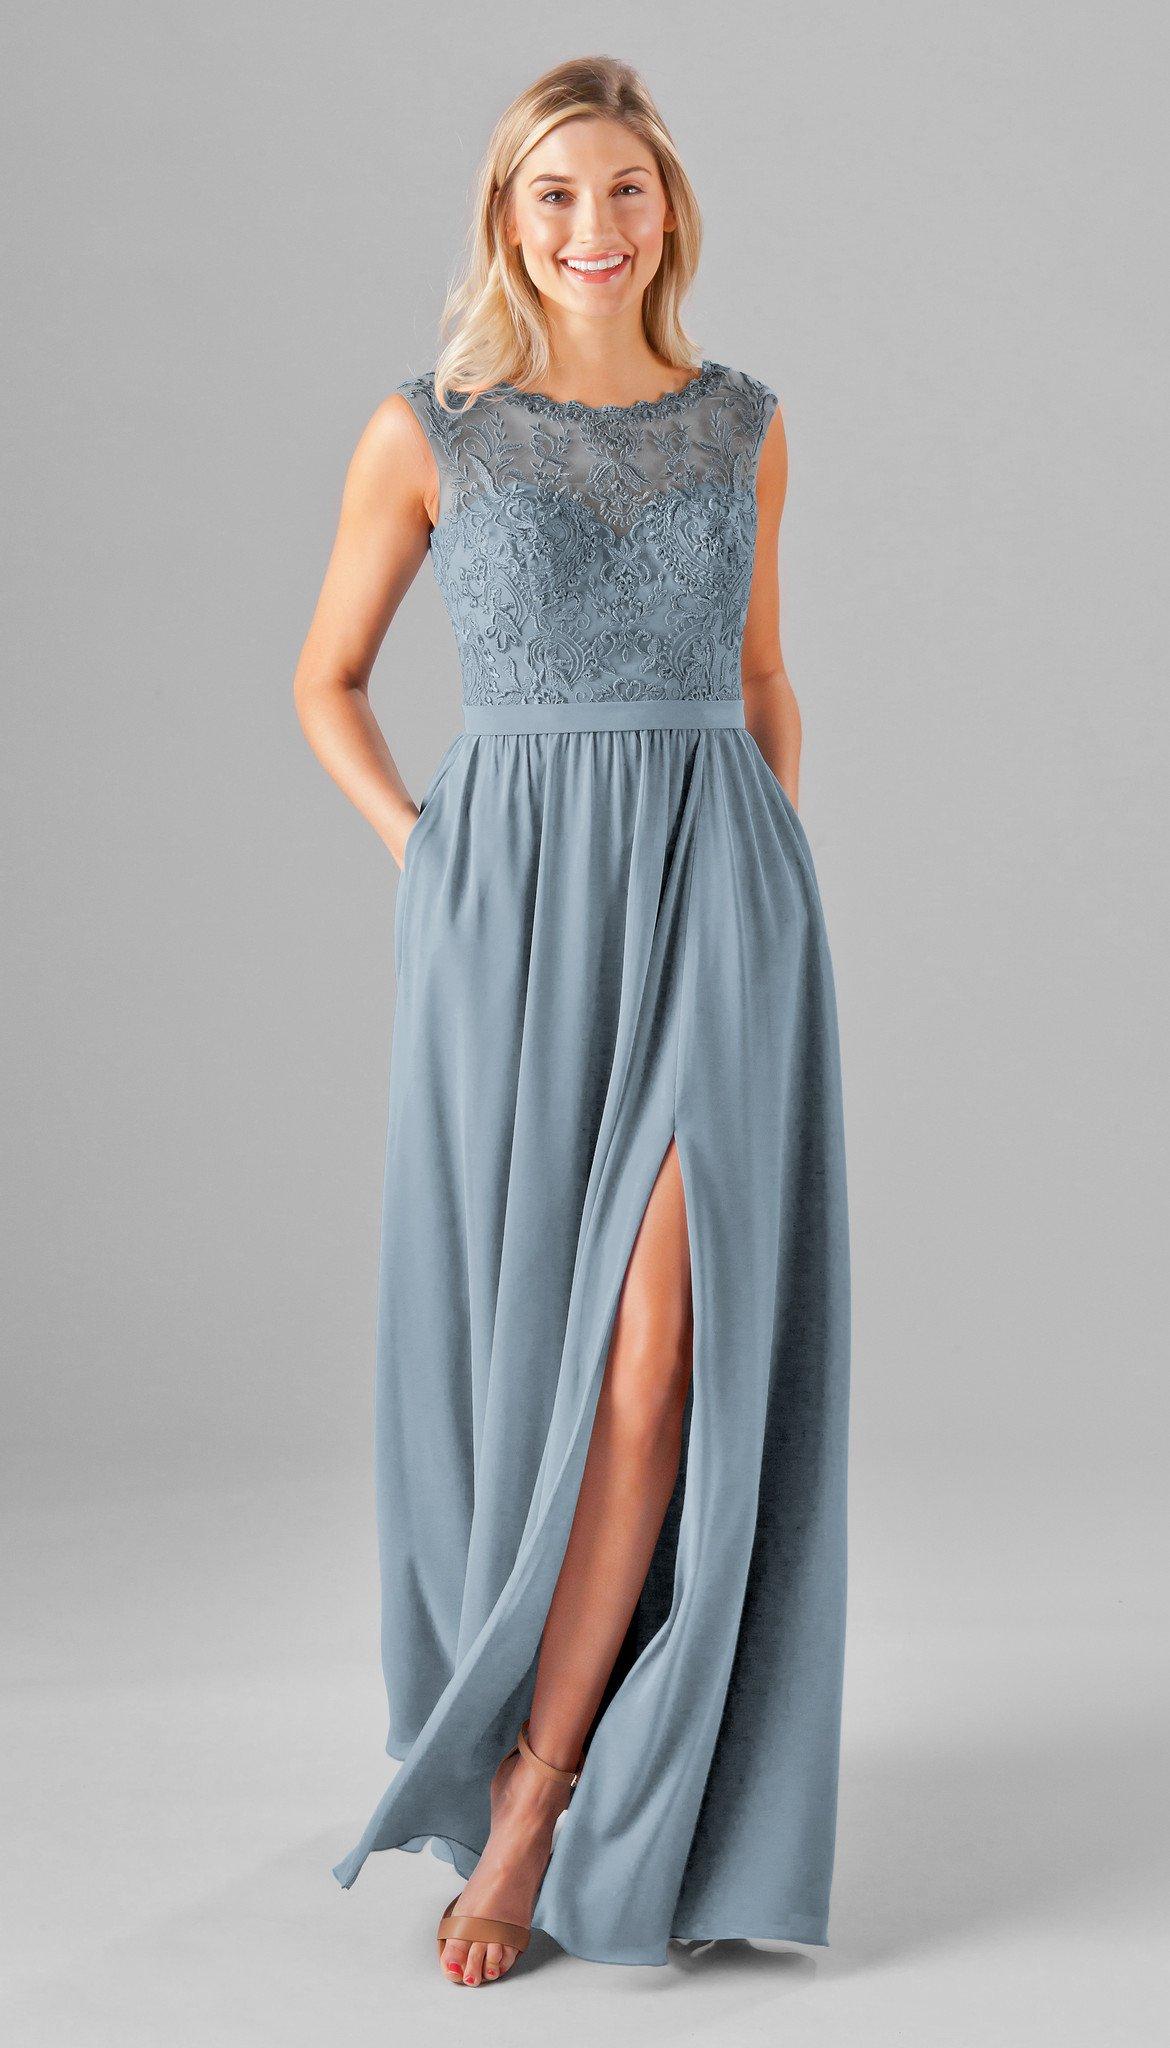 28138d9ea1 Slate Blue Chiffon Bridesmaid Dress - Gomes Weine AG